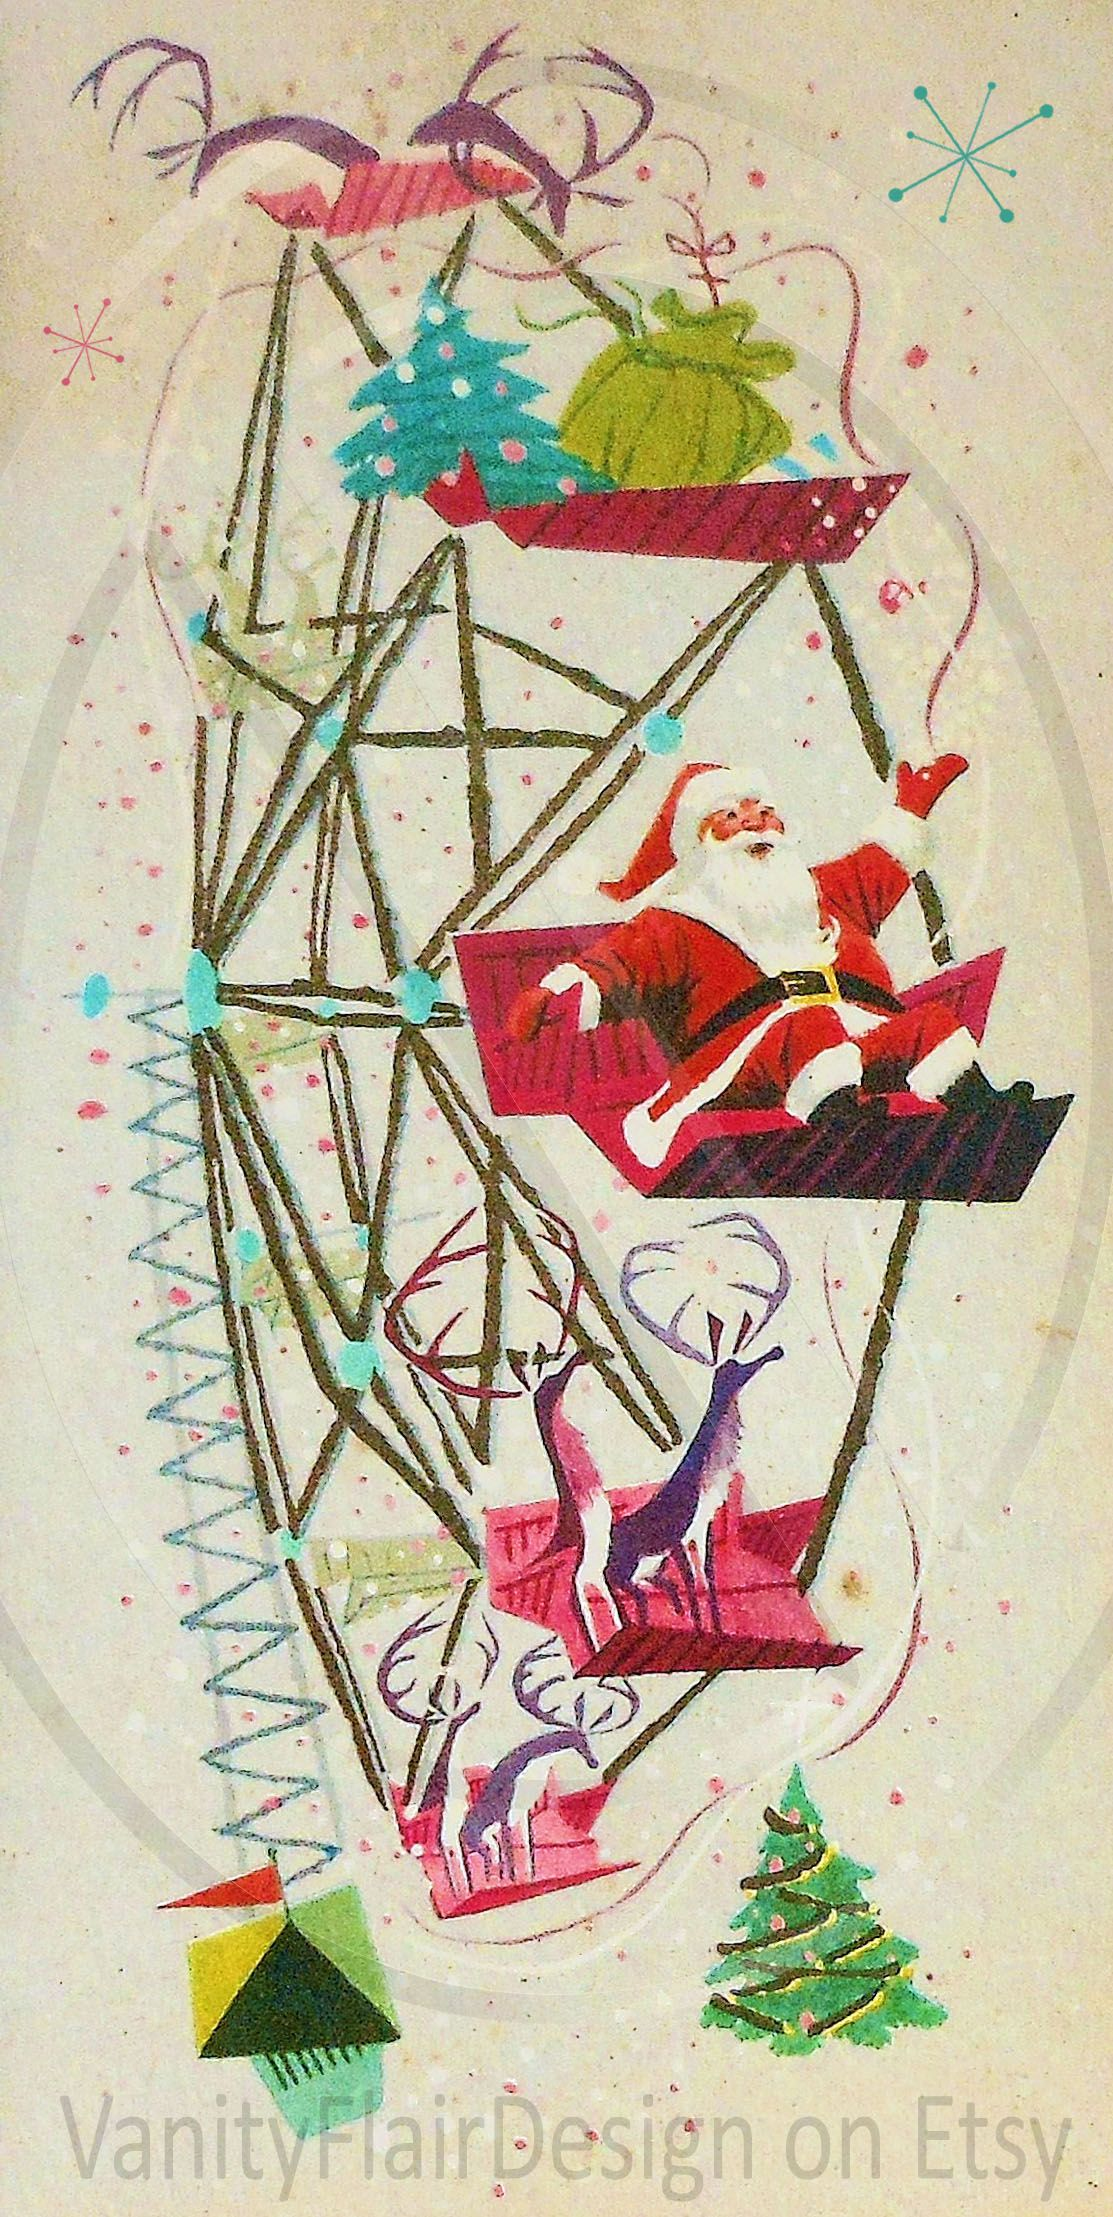 Retro Christmas Card Vintage Christmas Card Antique Christmas Card